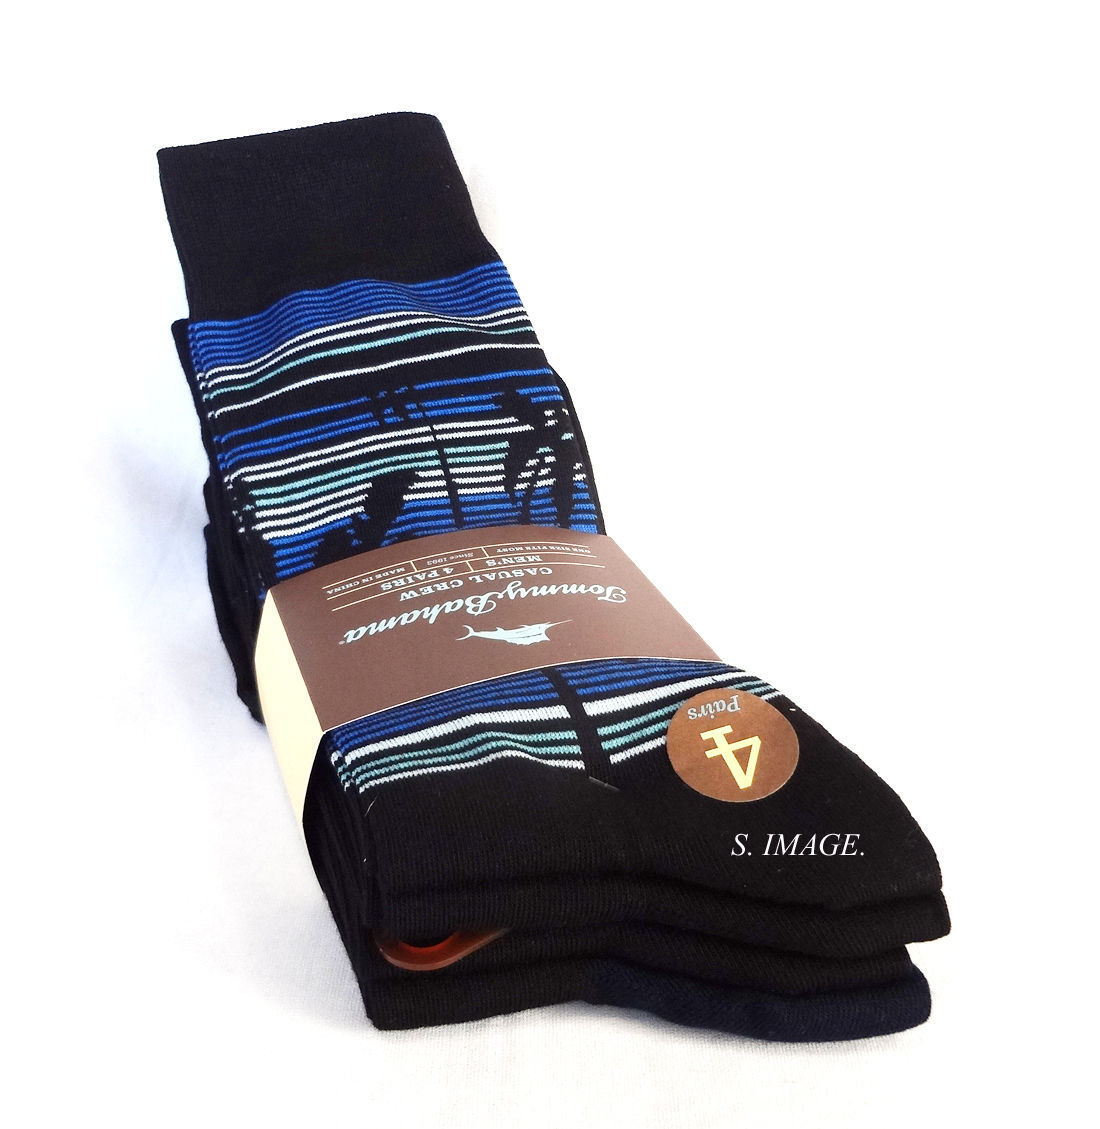 TOMMY BAHAMA Men's CASUAL CREW Socks 4 Pairs Black OSFM - New!